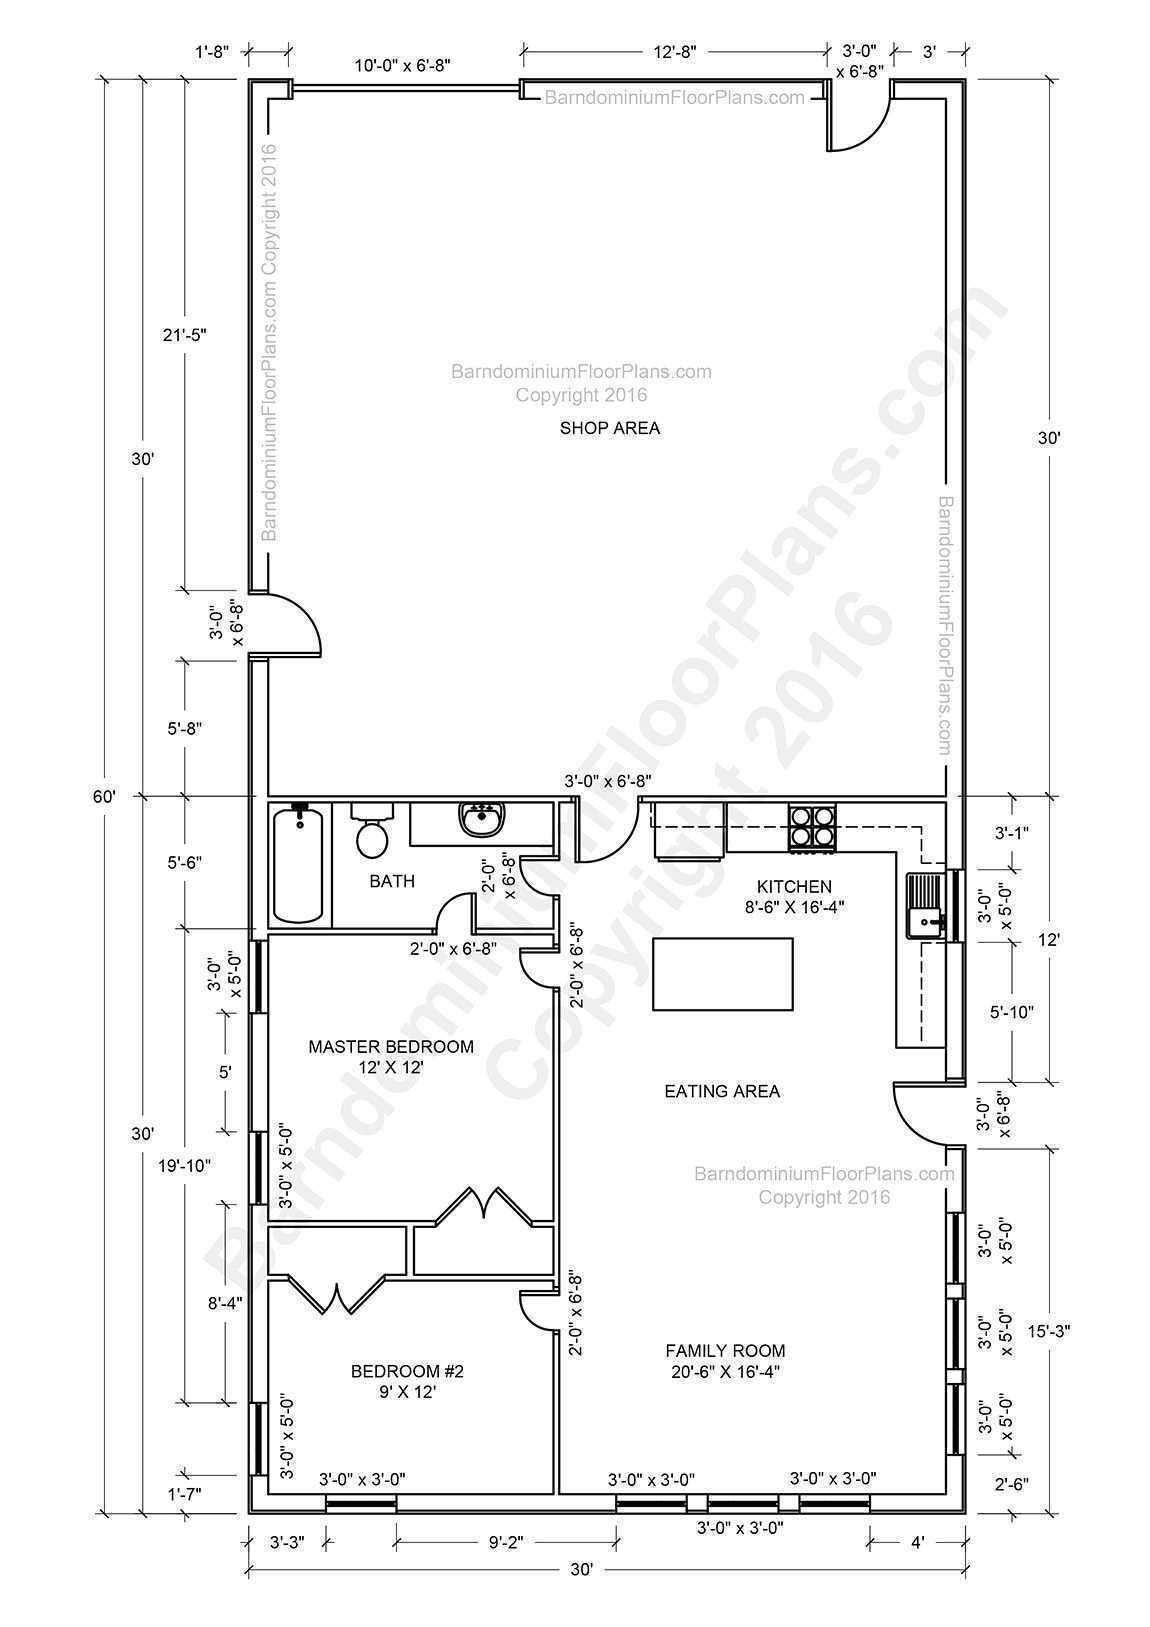 House Shop Combo Plans Barndominium Floor Plans Pole Barn House Plans Shop House Plans